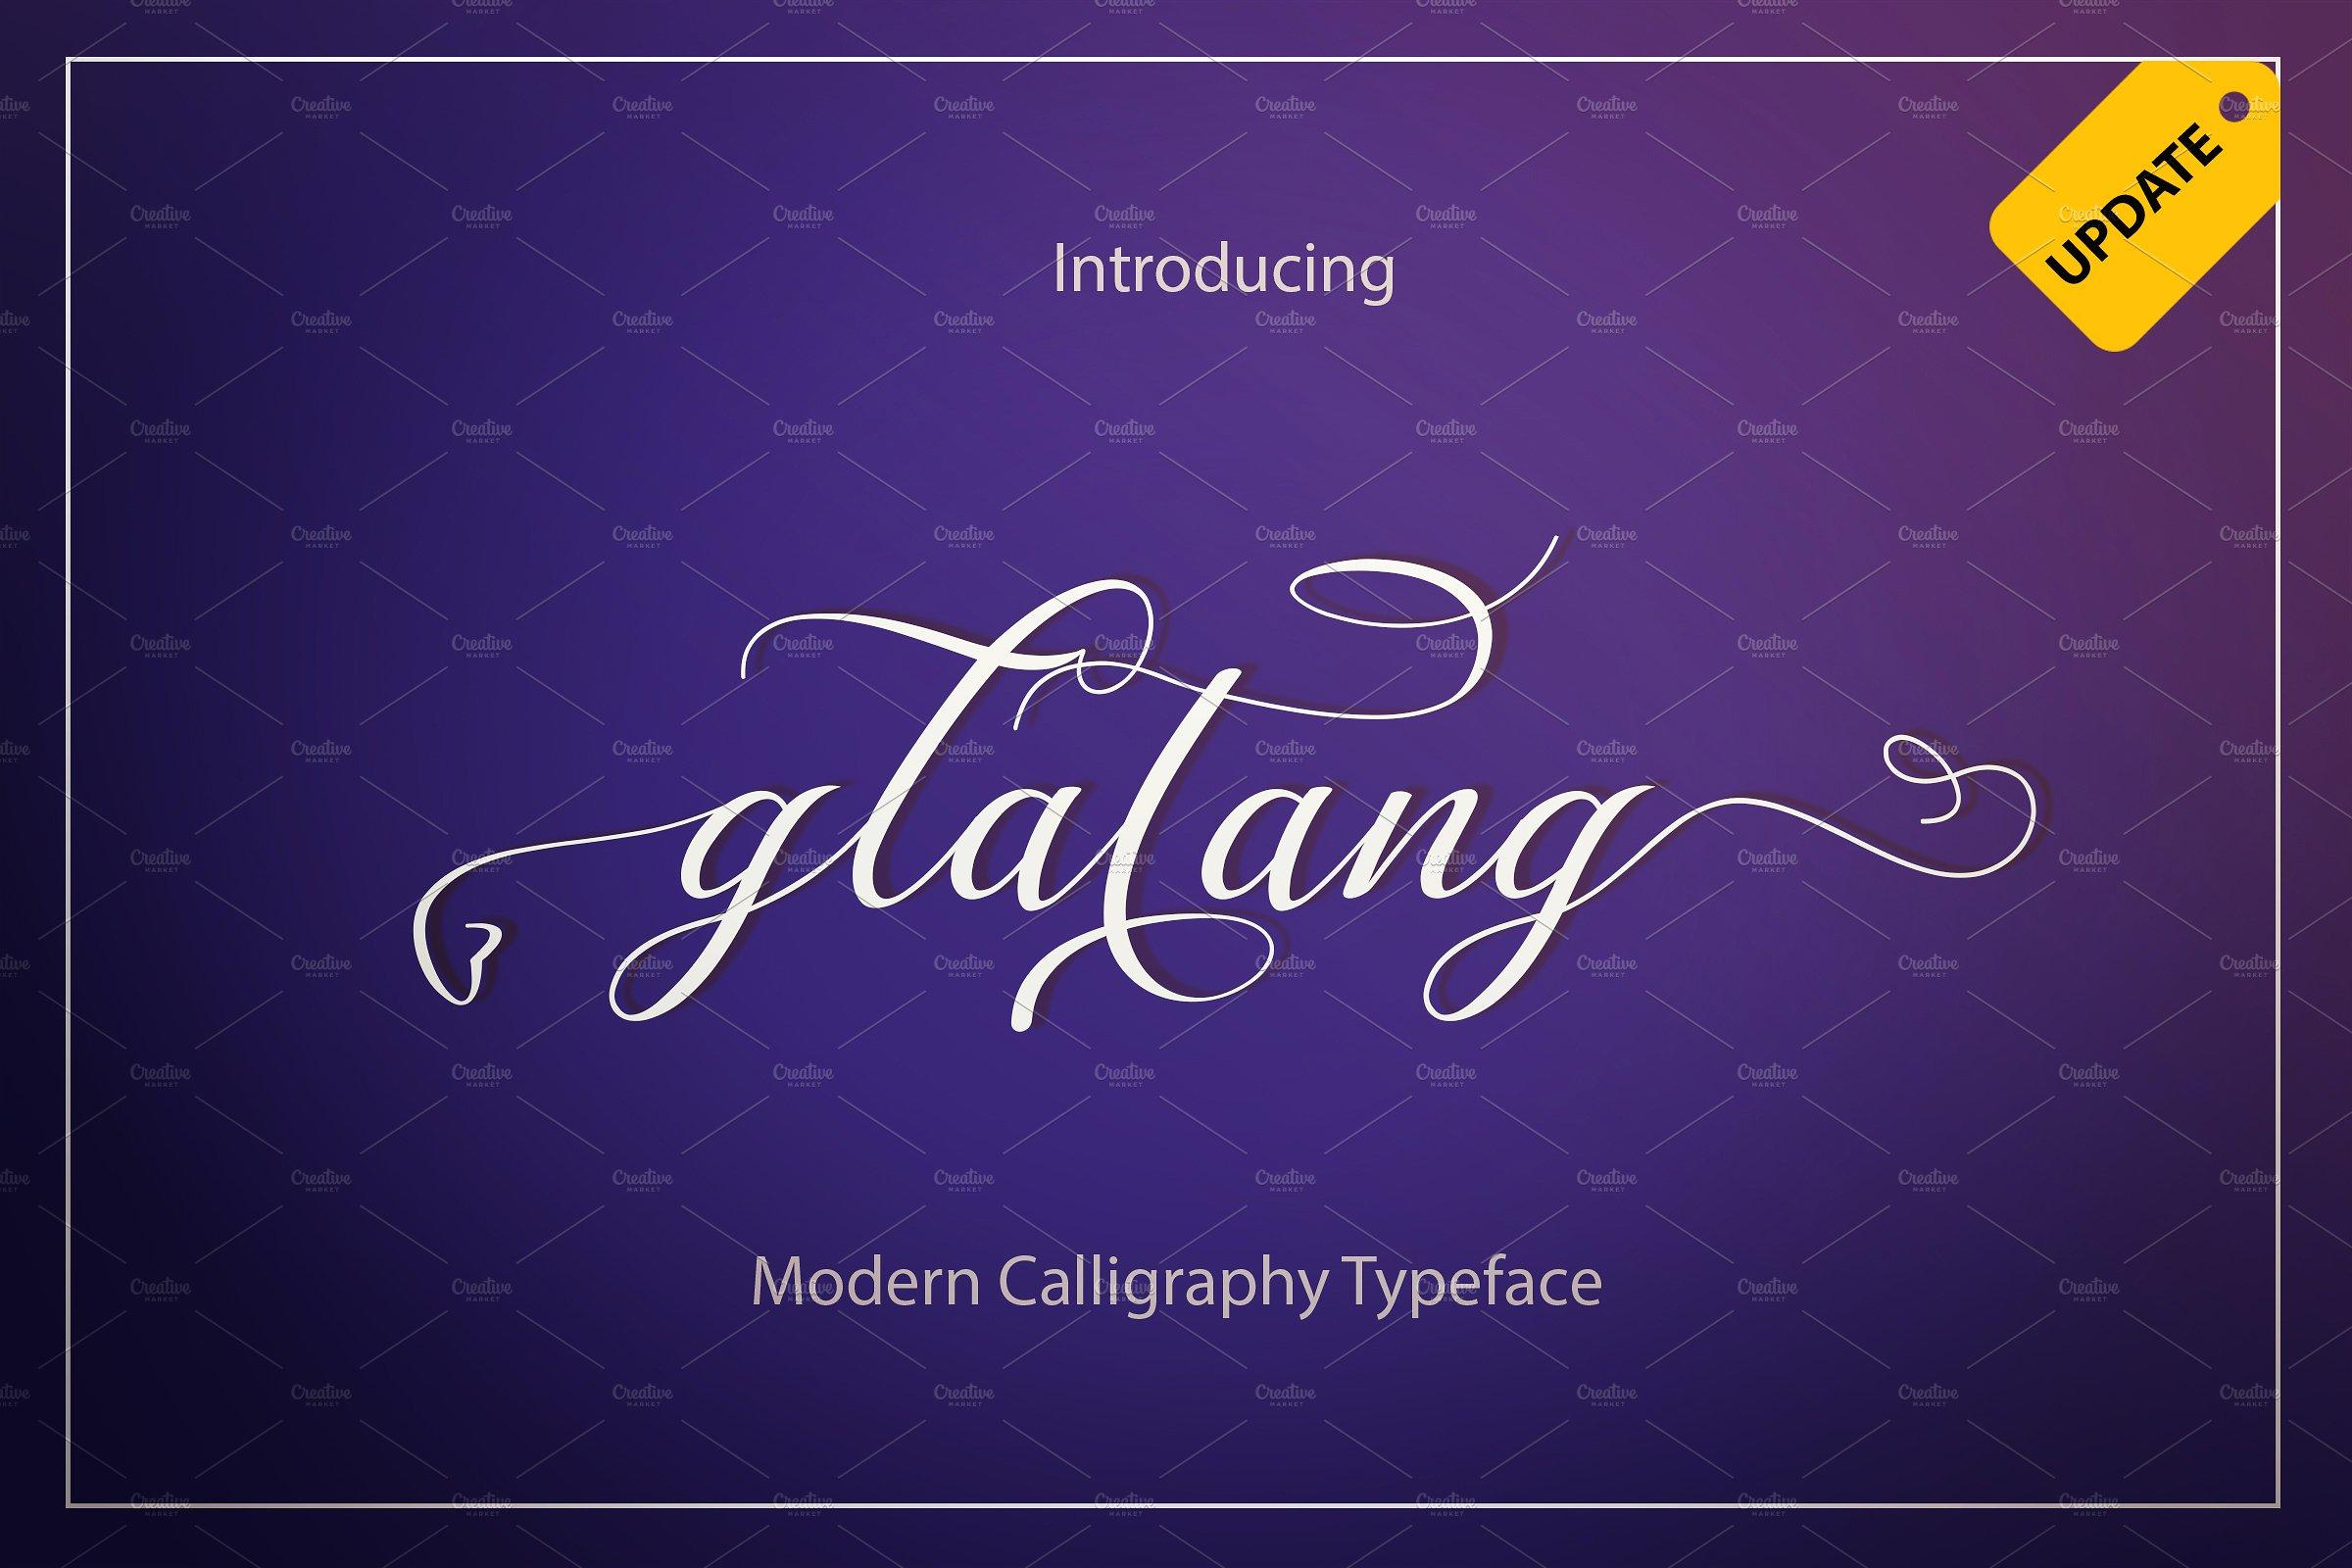 Glatang Calligraphy